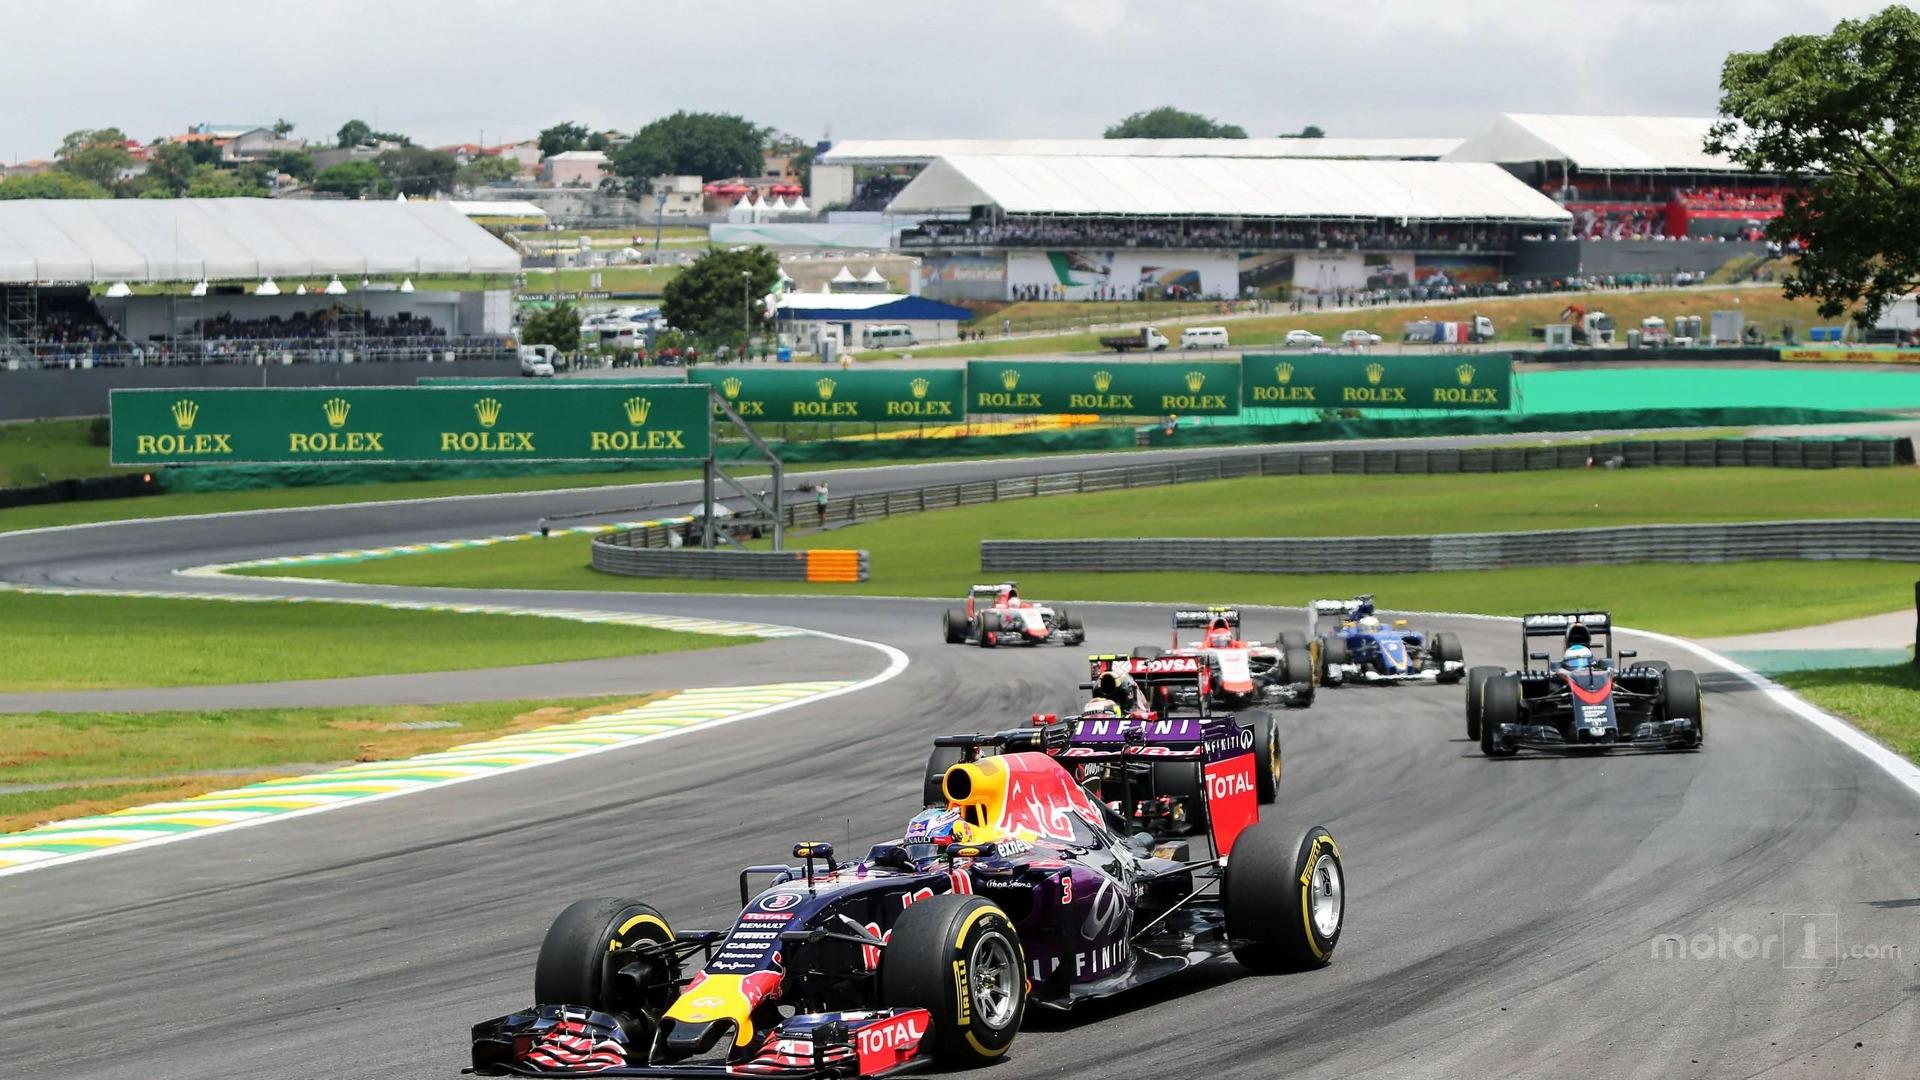 Brazilian GP claims Interlagos F1 date safe until 2020